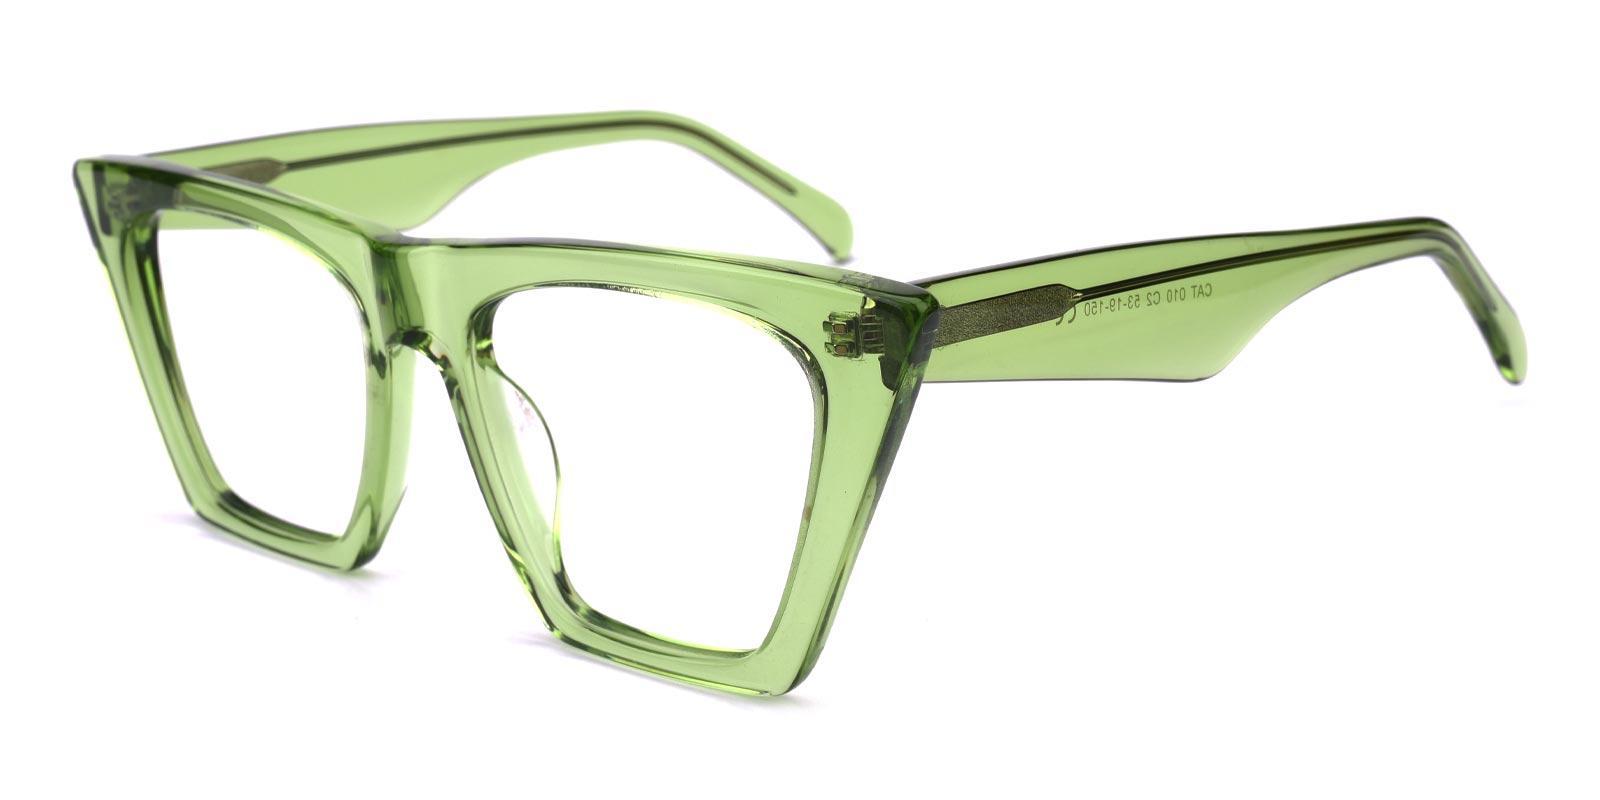 Alva-Green-Cat-Acetate-Eyeglasses-additional1